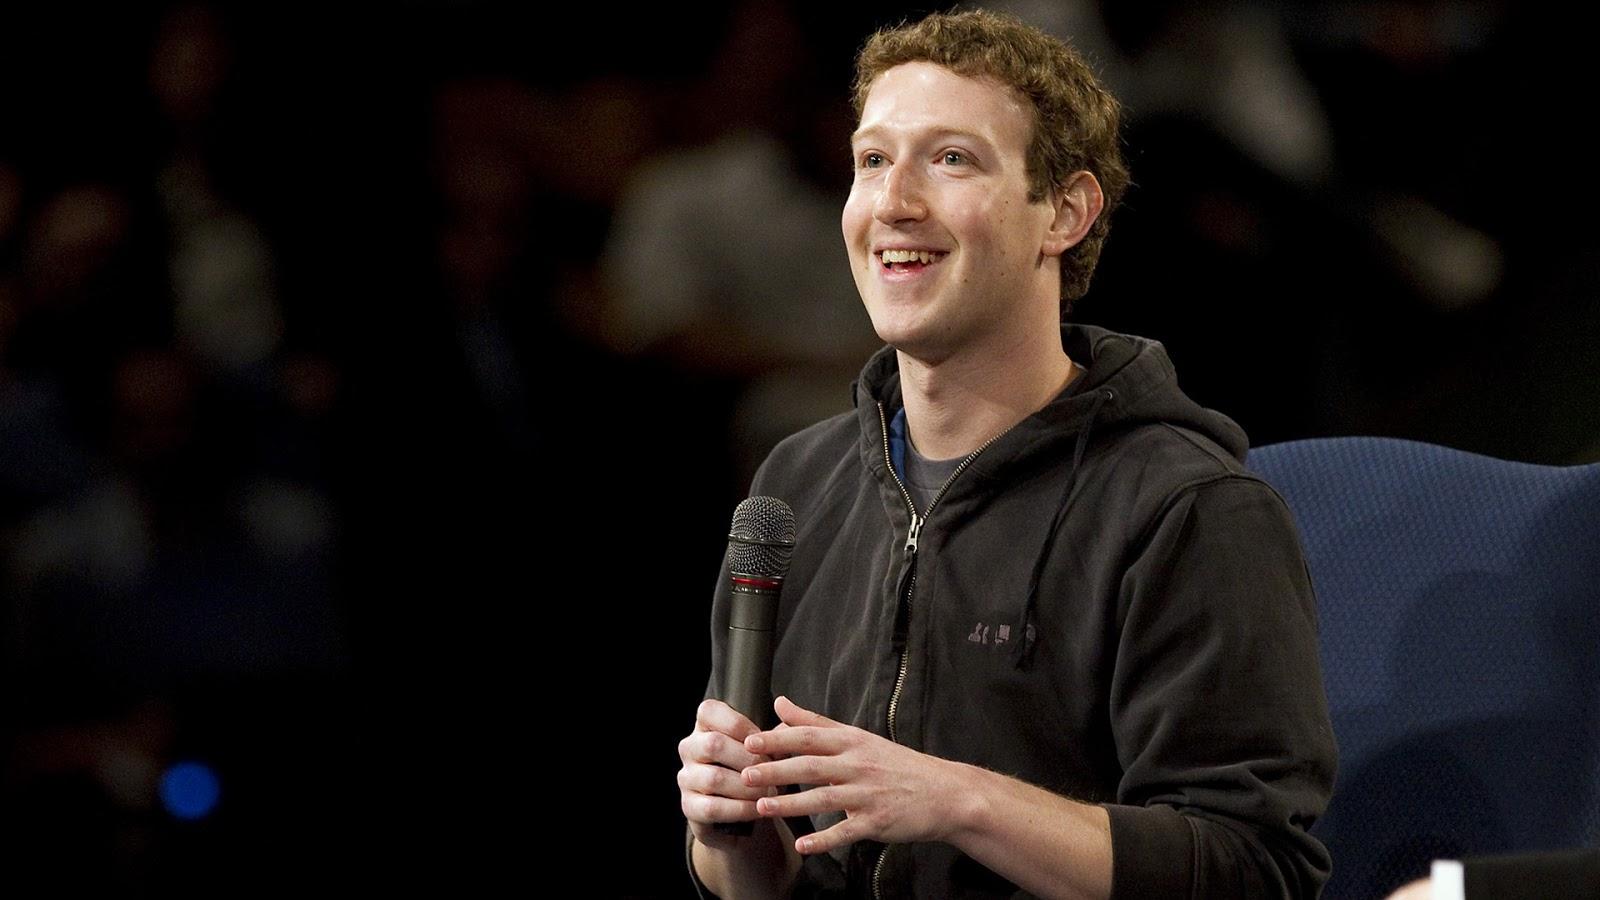 Mark Zuckerberg Wallpaper Photos 59725 1600x900px 1600x900